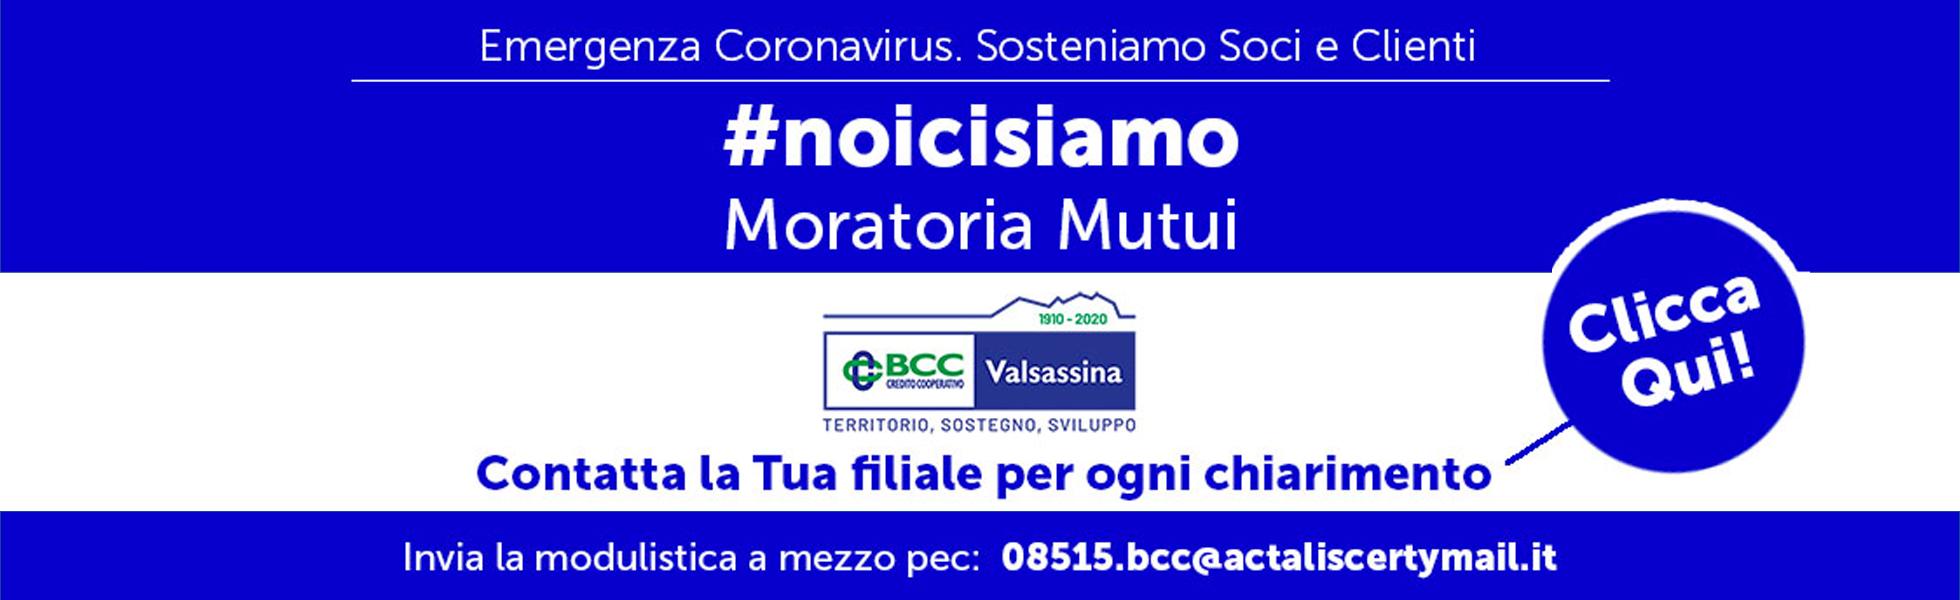 Banner Moratoria Mutui mobile